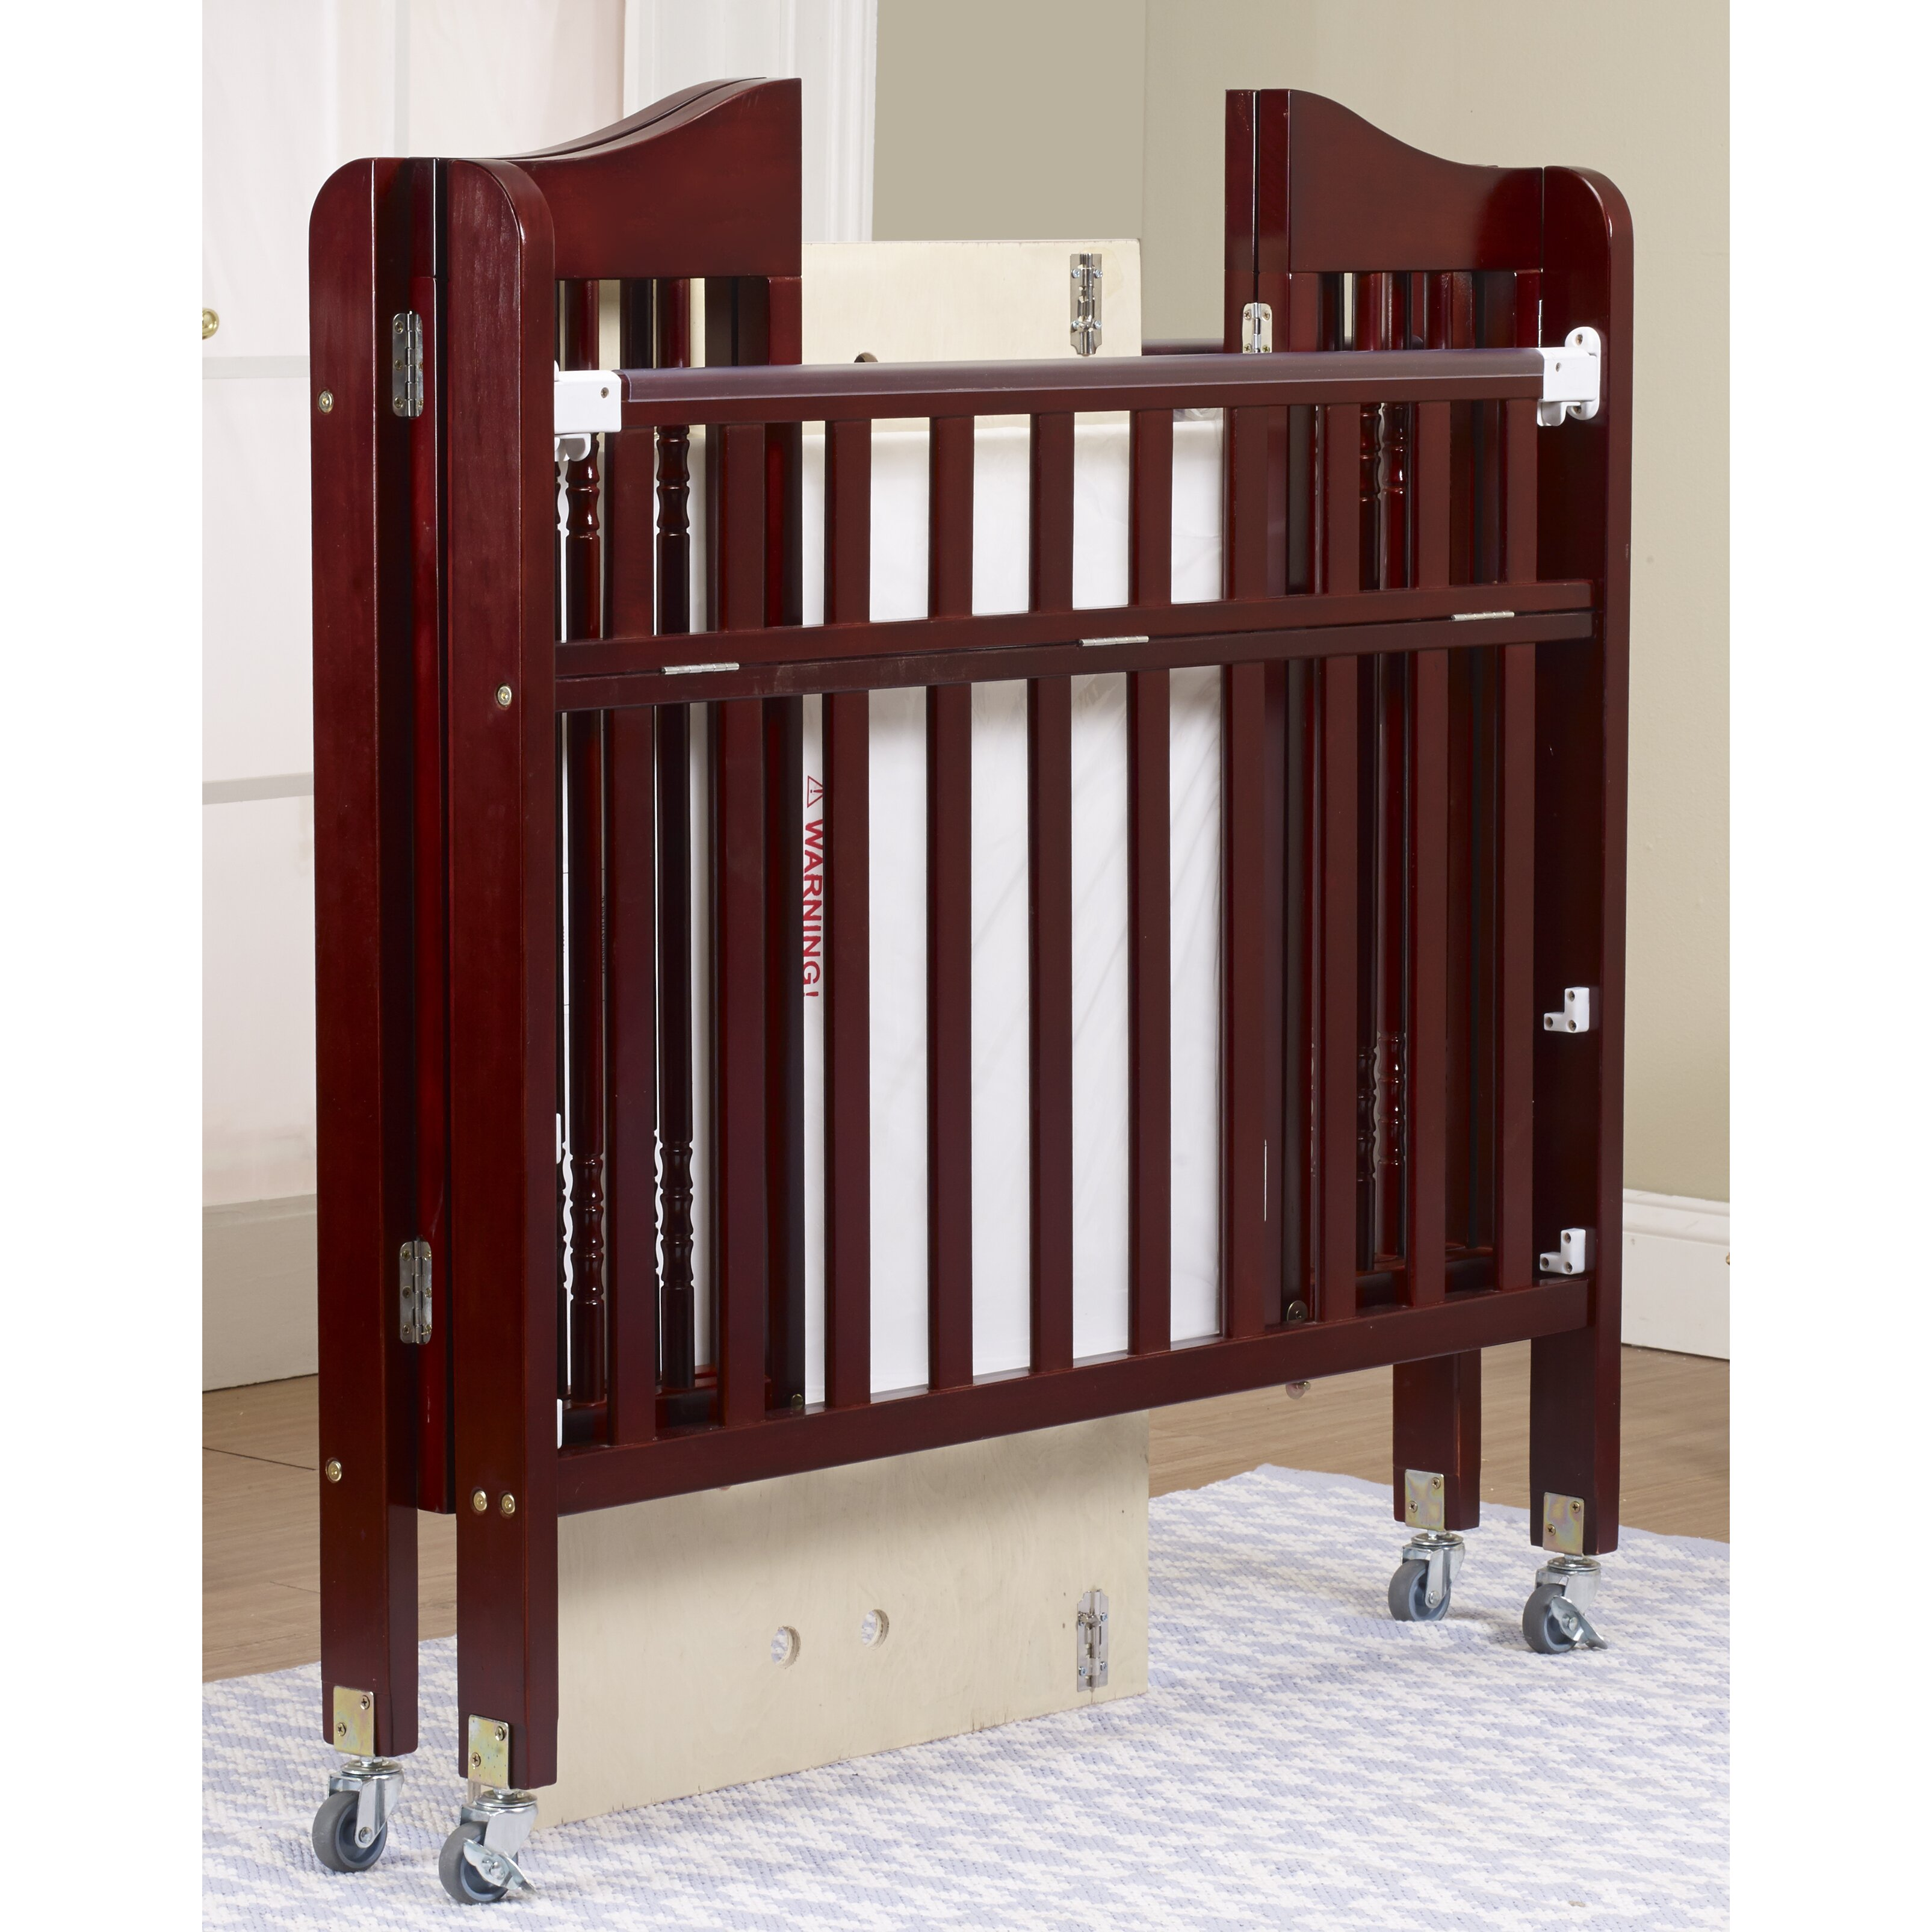 Evacuation crib for sale - Orbelle Trading Nataliel Convertible Crib With Mattress